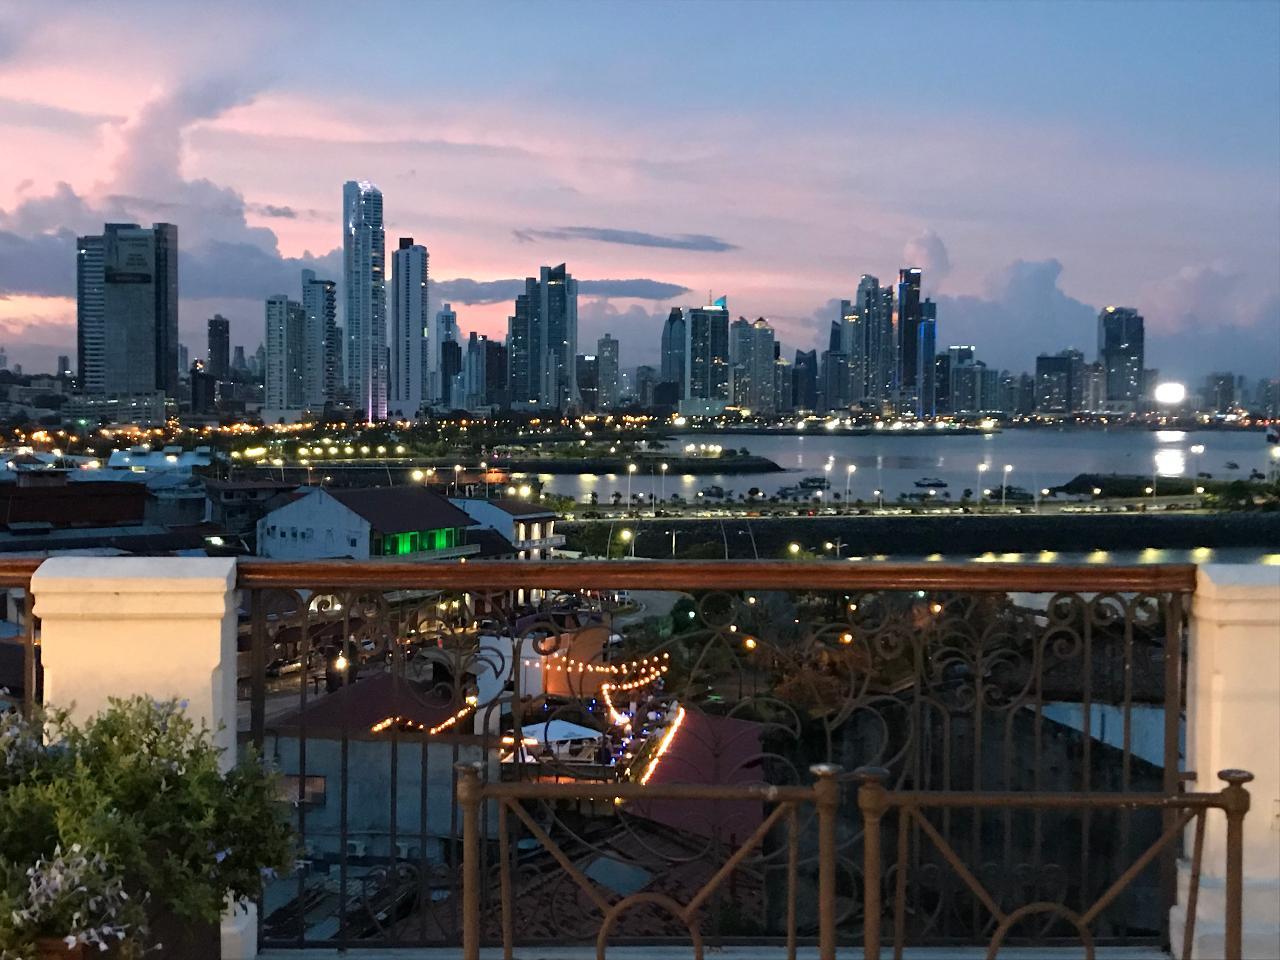 New Years Eve in Panama